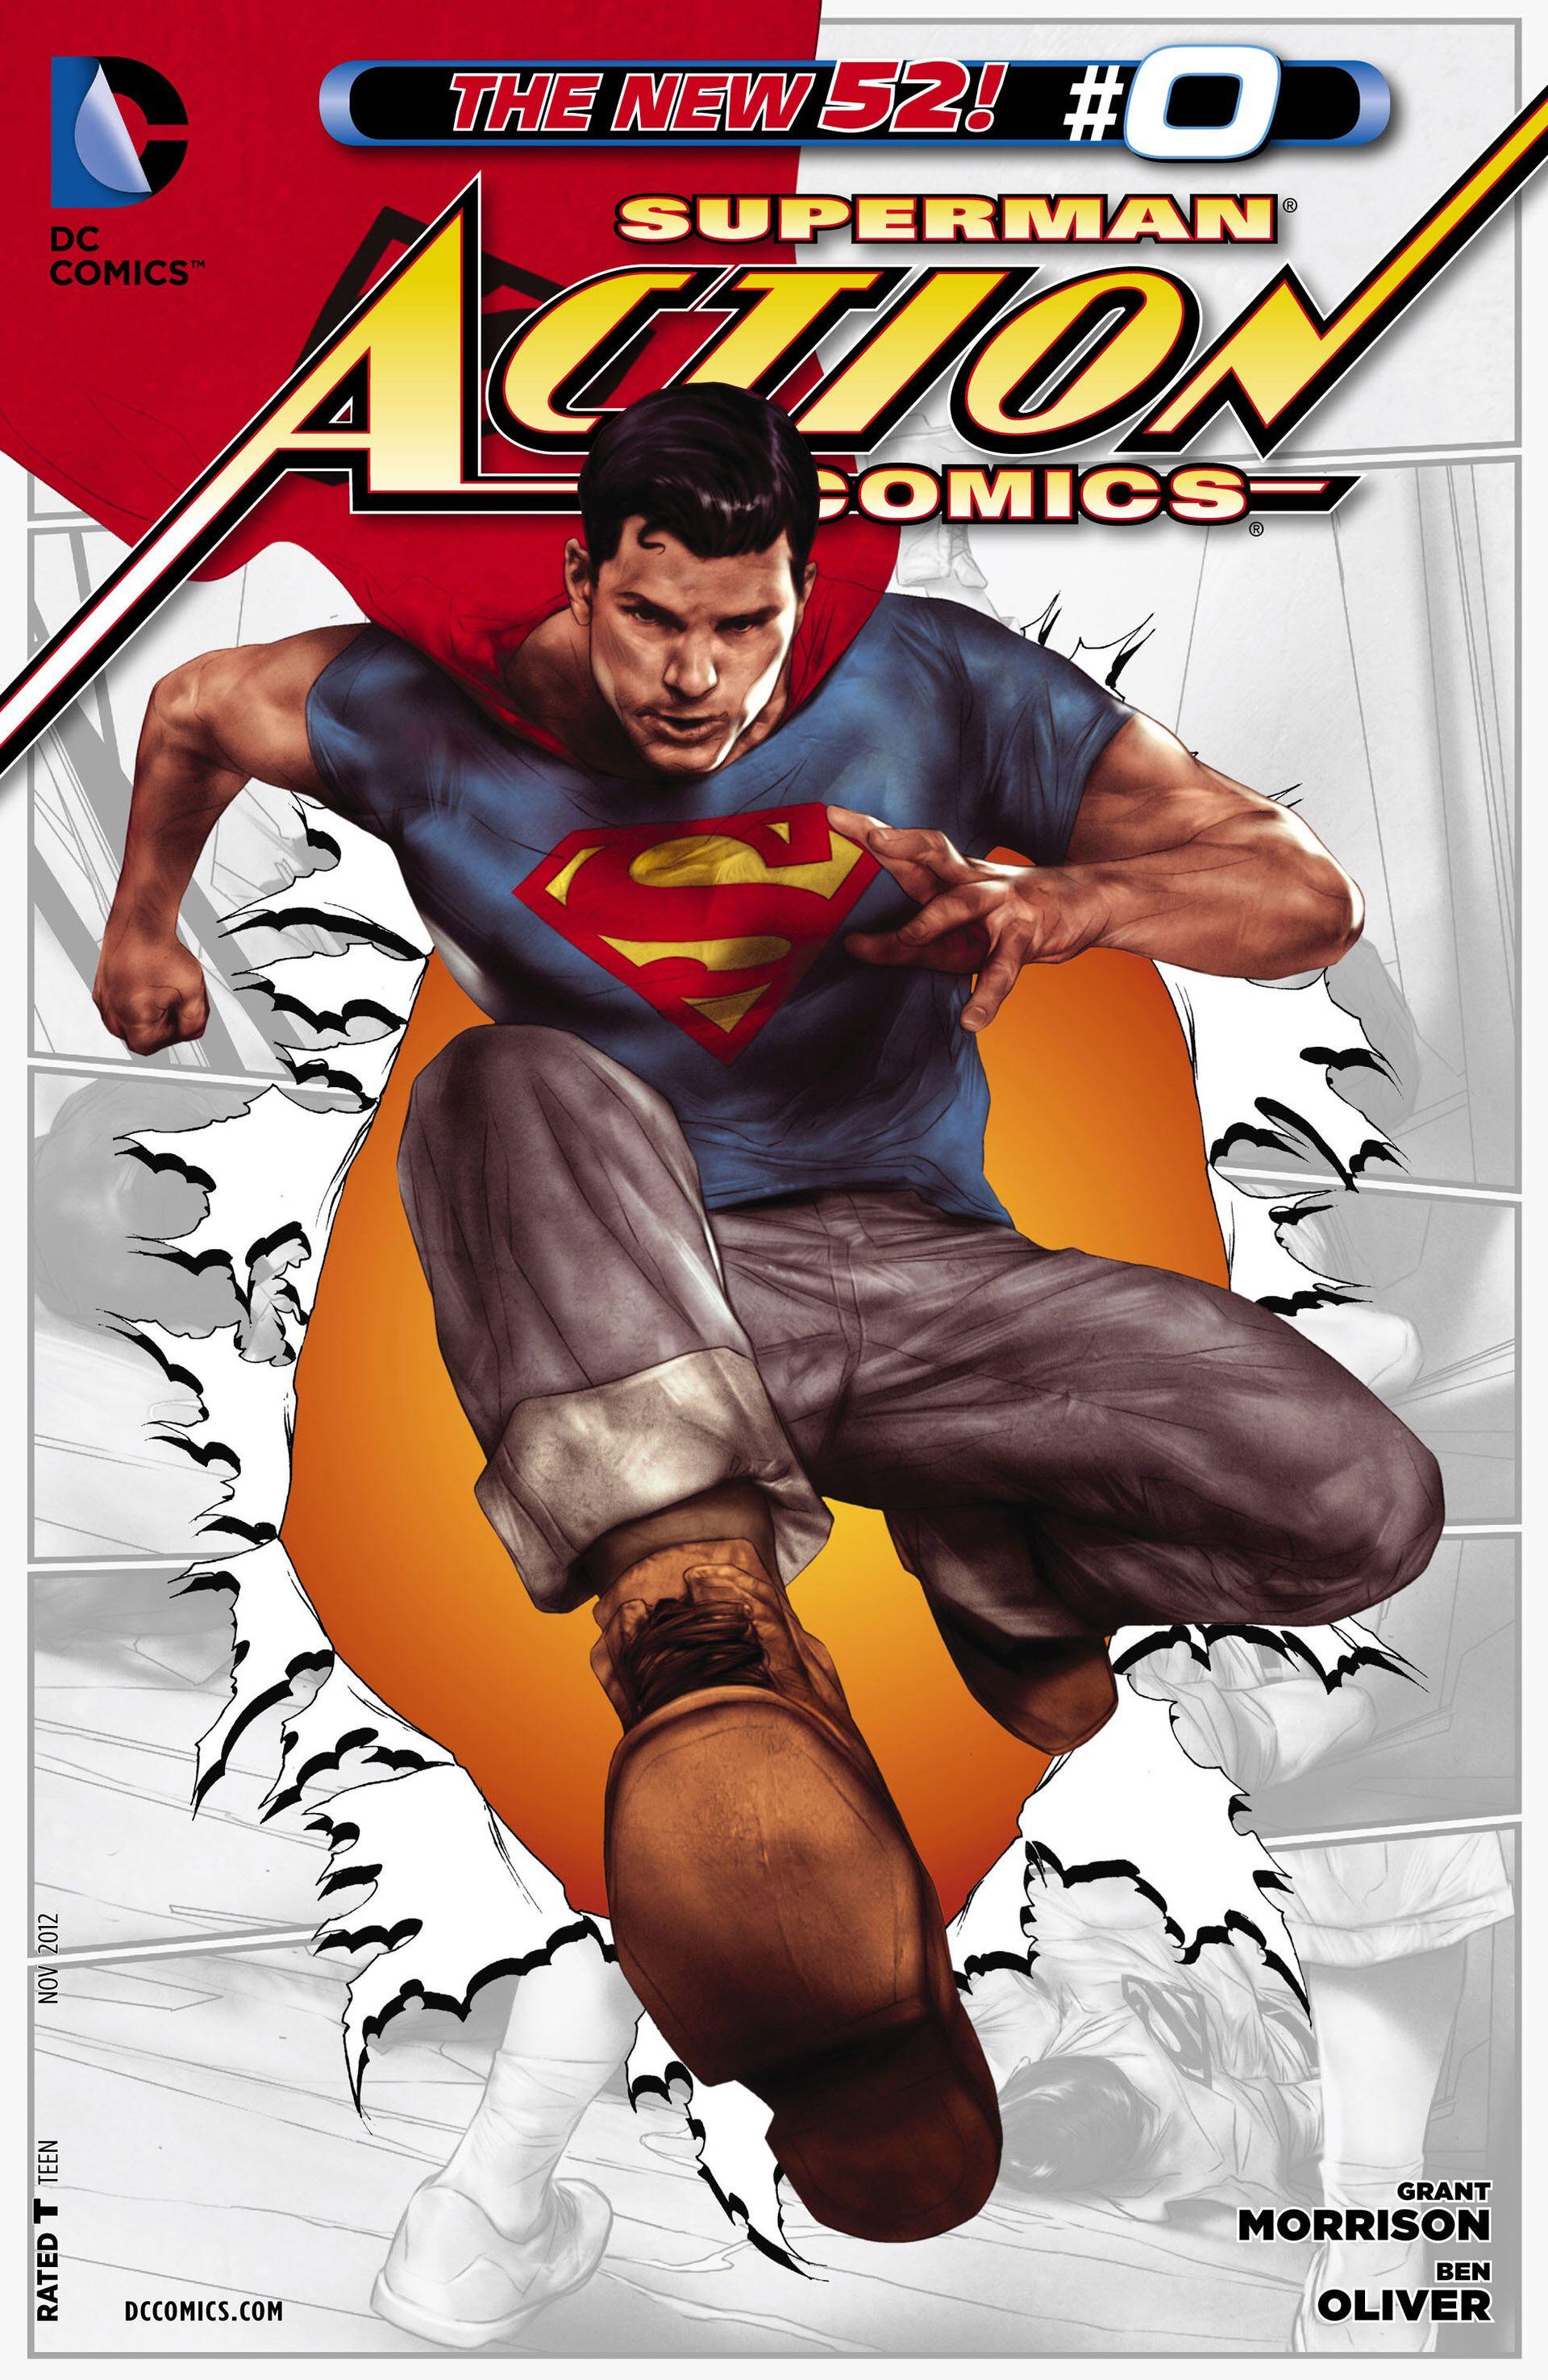 VOODOO #0 DC NEW 52 COMIC BOOK 1 FINAL ISSUE ORIGIN OF PRIS IS REVEALED